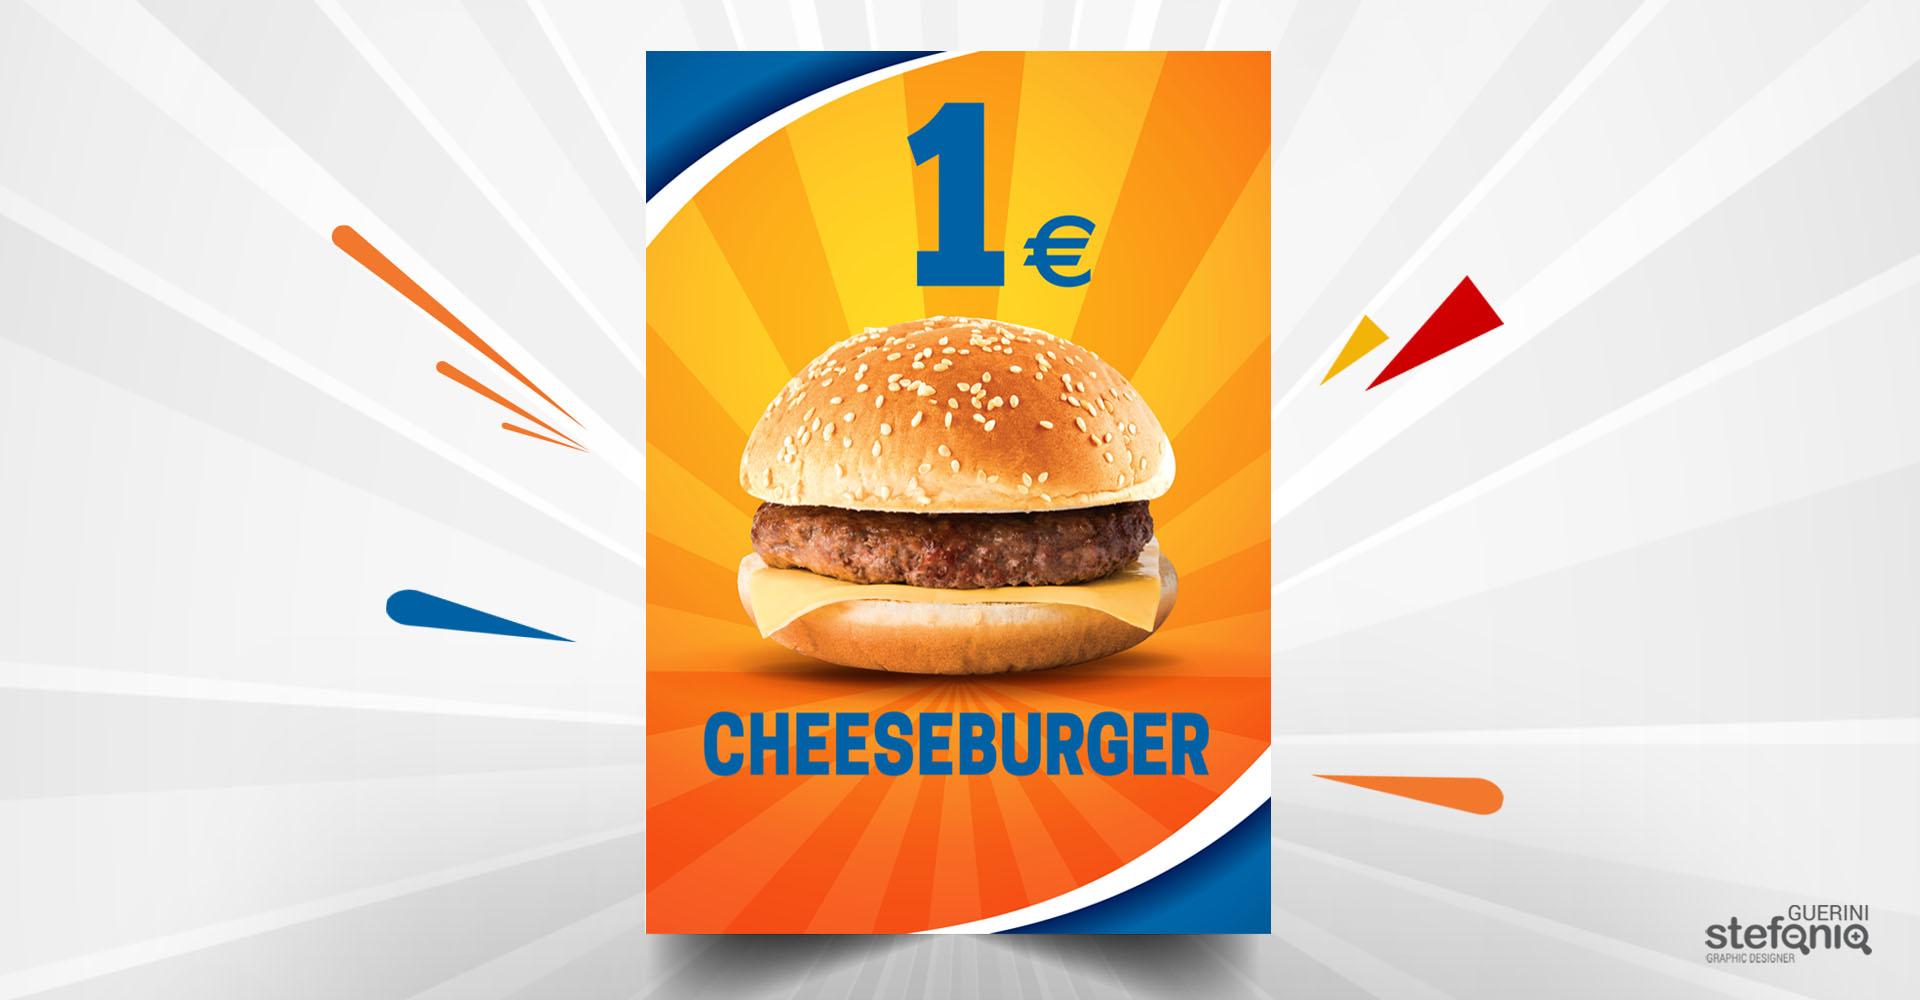 CINELANDIA_hamburger stefania-guerini-graphic-designer-immagine-coordinata-logo-locandine-flyer-stampa cantu como